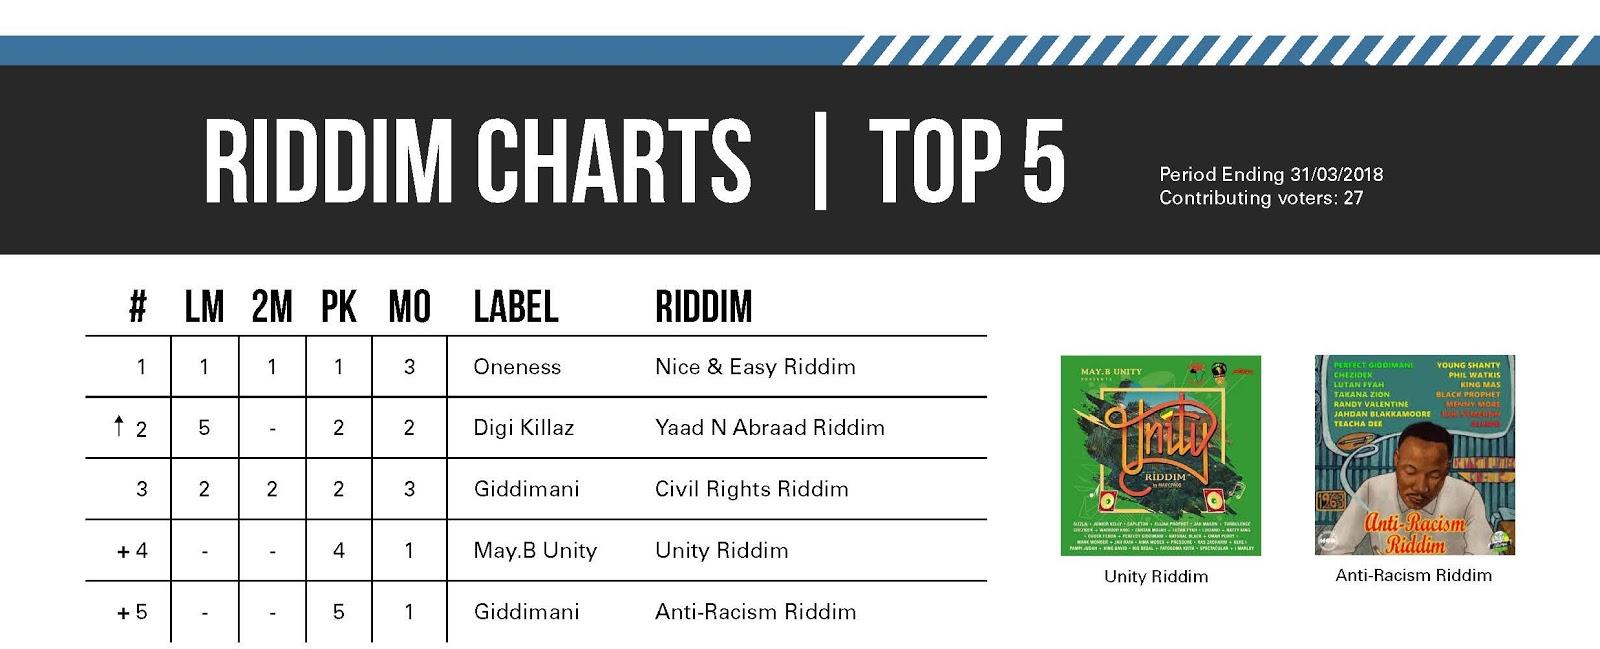 Global Reggae Charts - Issue #12 - April 2018   ItaL rOOts RaDio